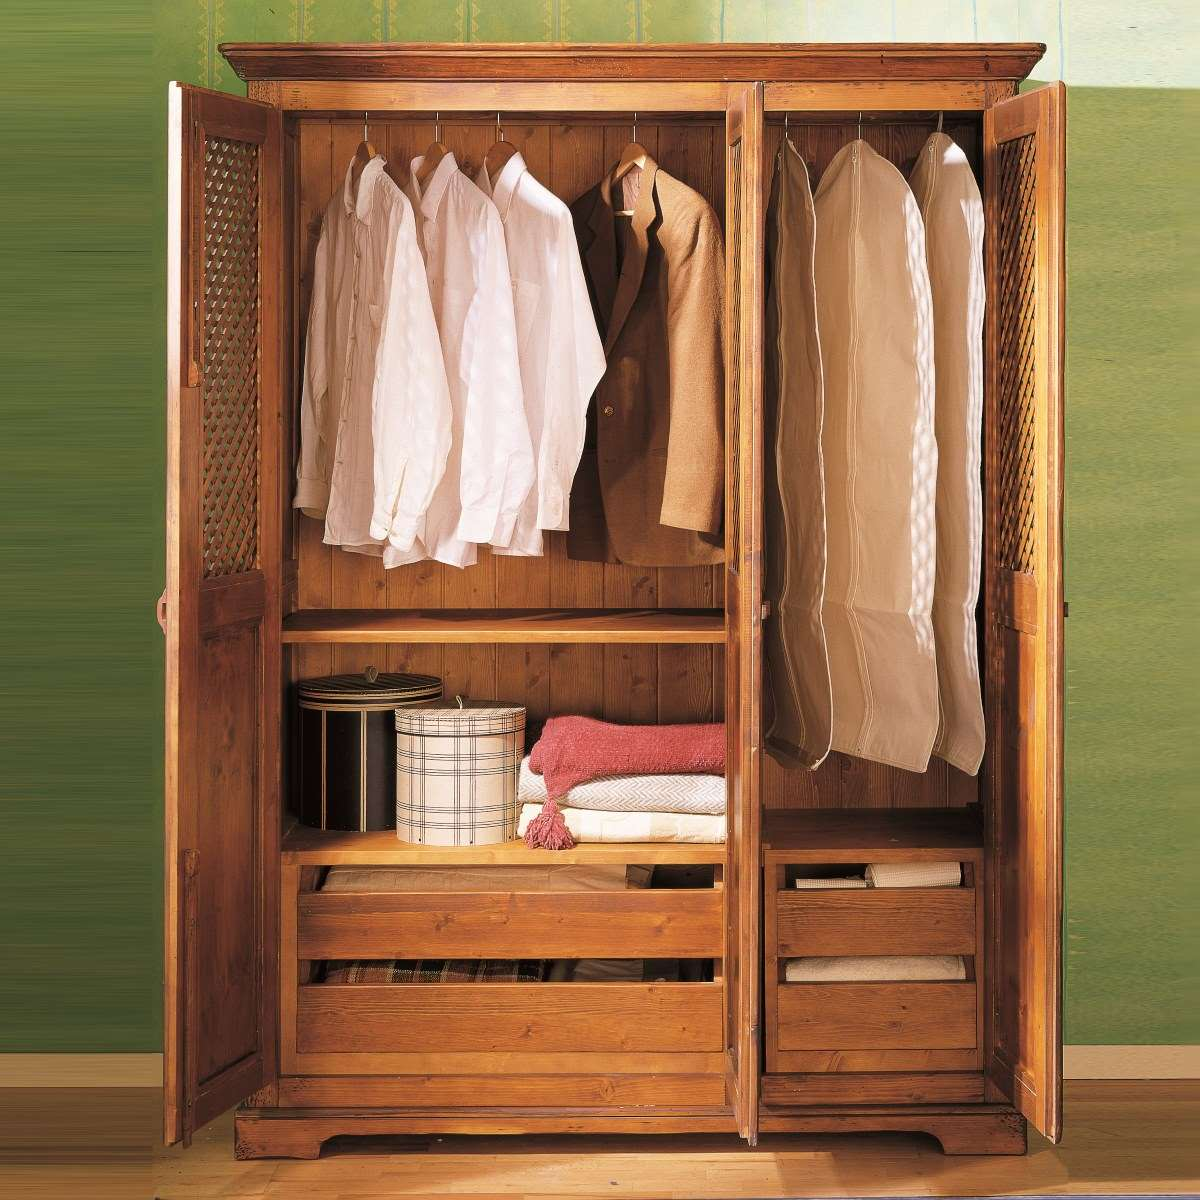 Armario r stico de madera en tres puertas ecor stico for Disenos de roperos para dormitorios